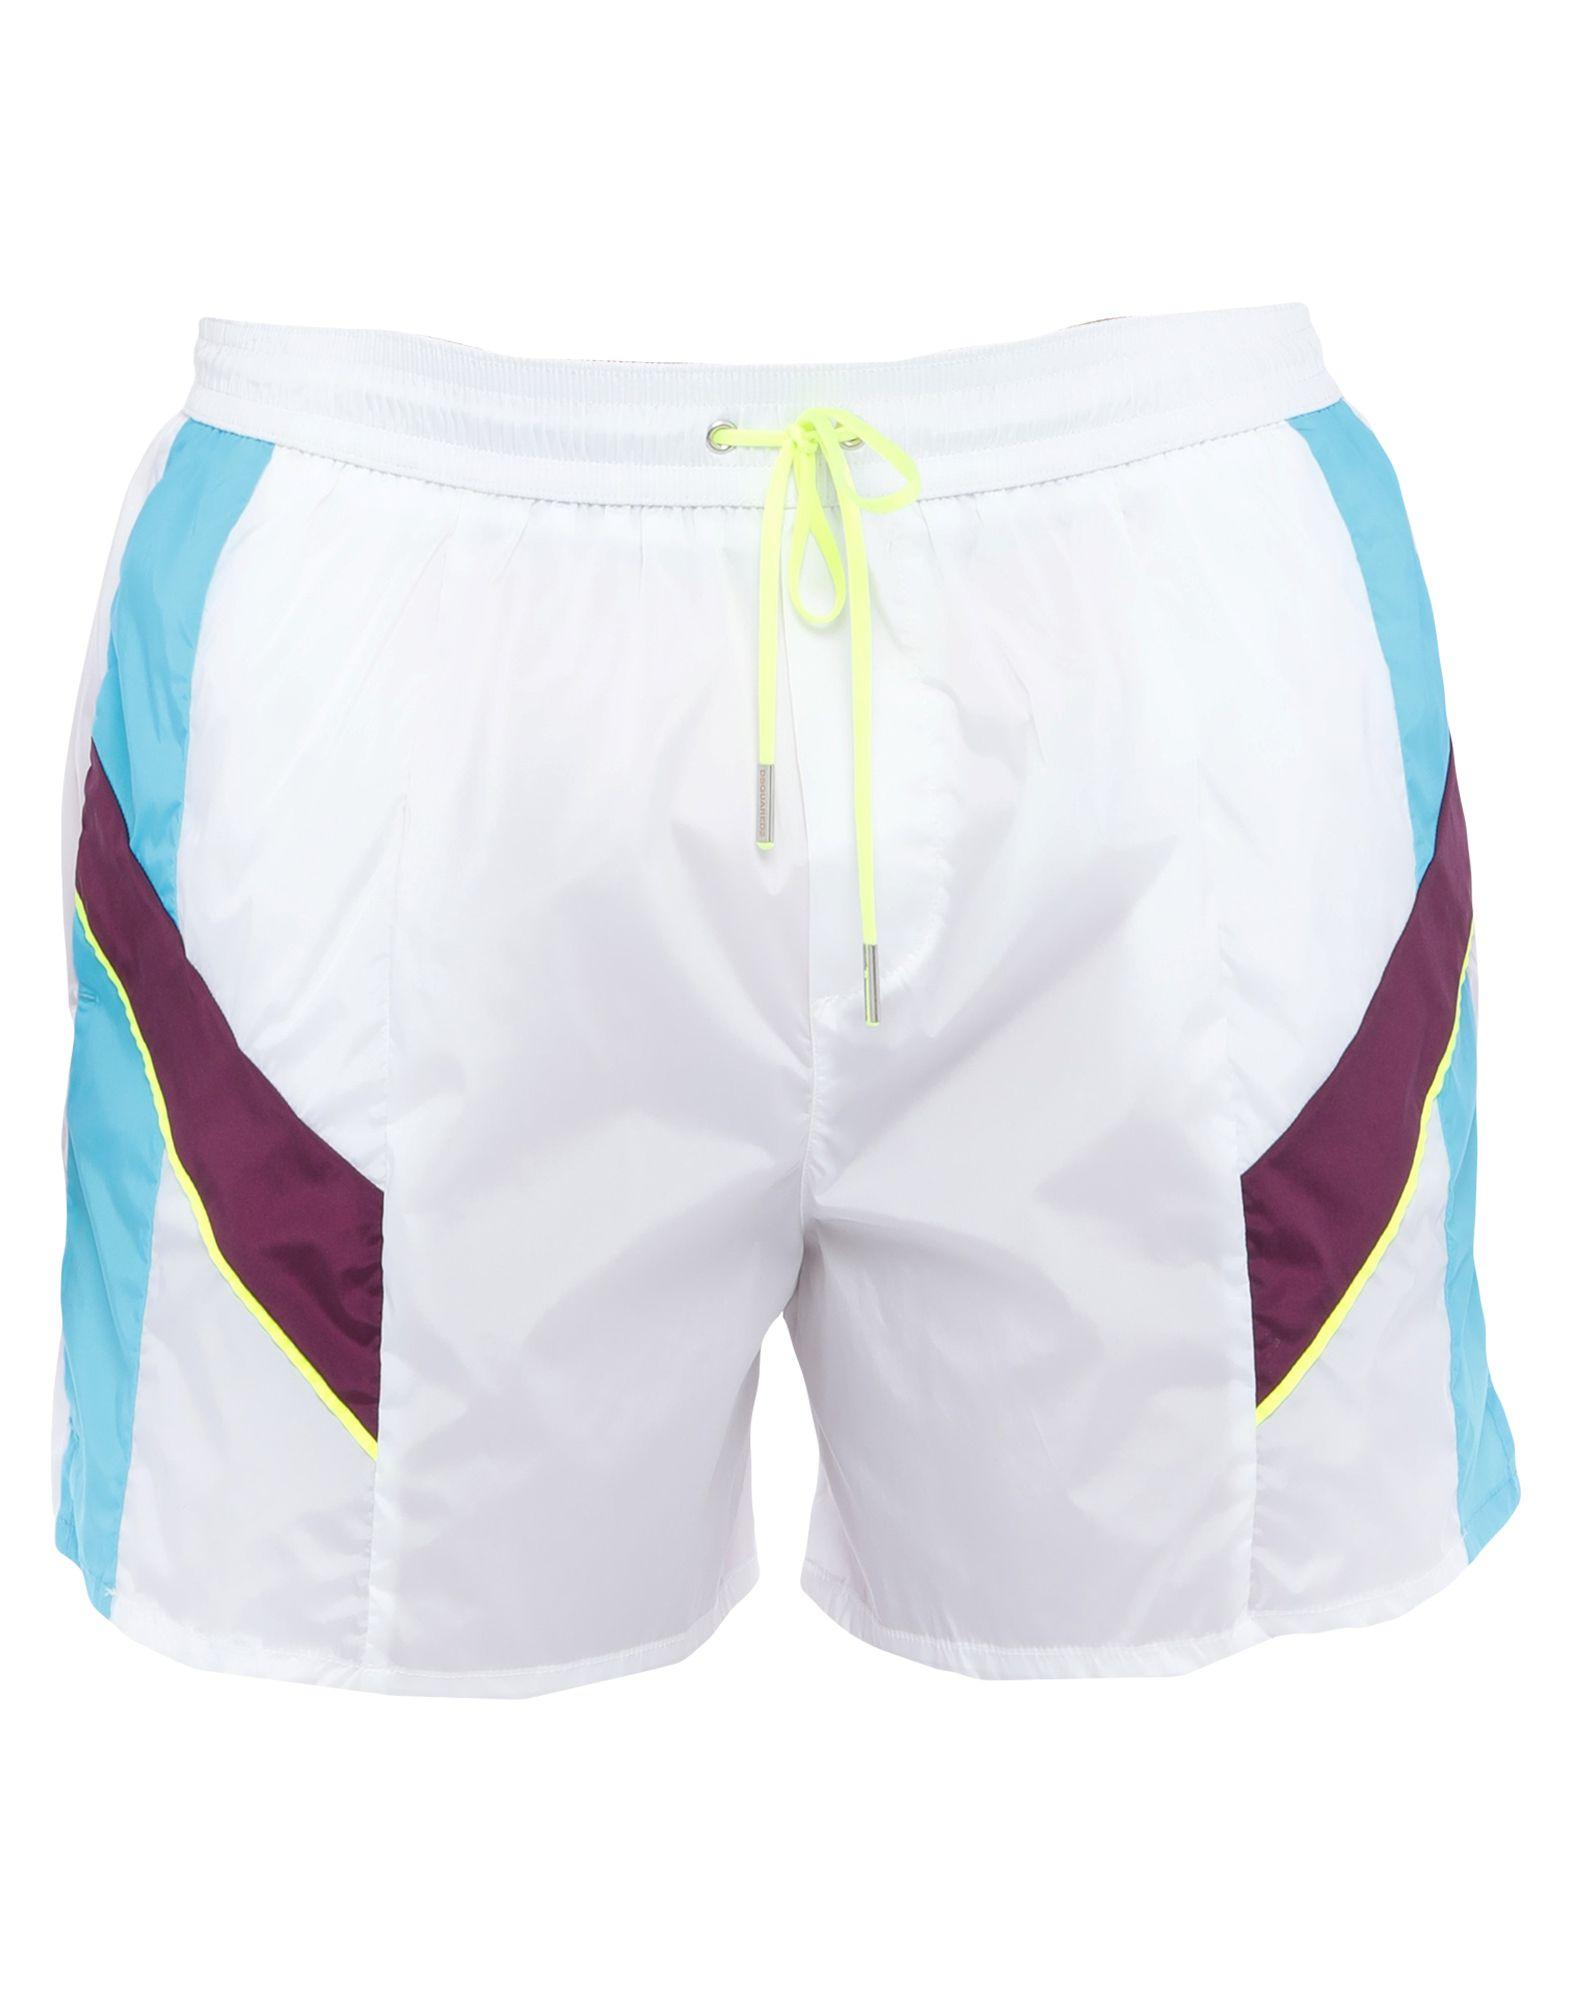 DSQUARED2 Шорты для плавания шорты для плавания 3 8 лет